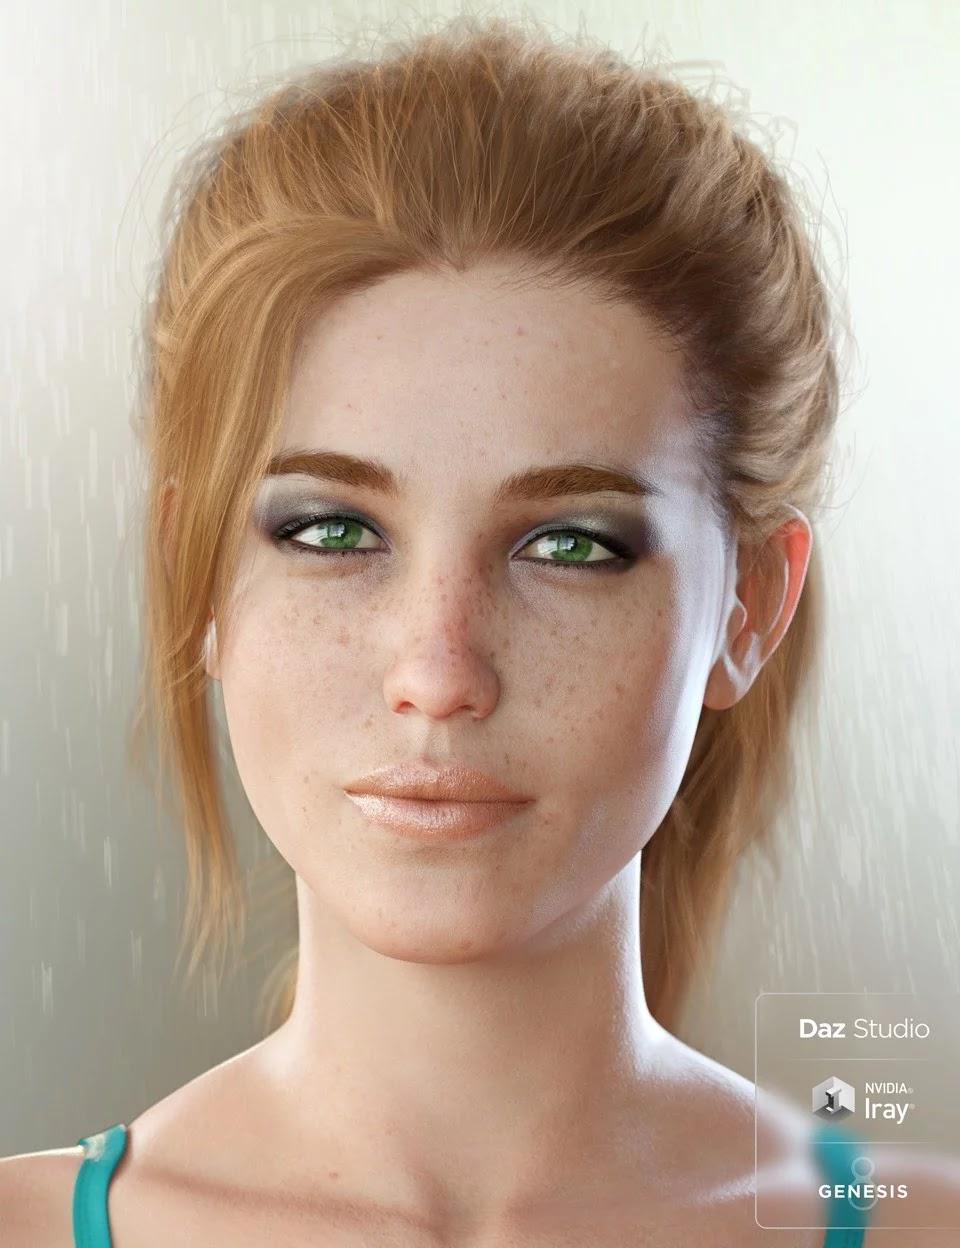 Poser and DAZ Studio 3D Models: Bridget 8|DAZ Studio and Poser Content